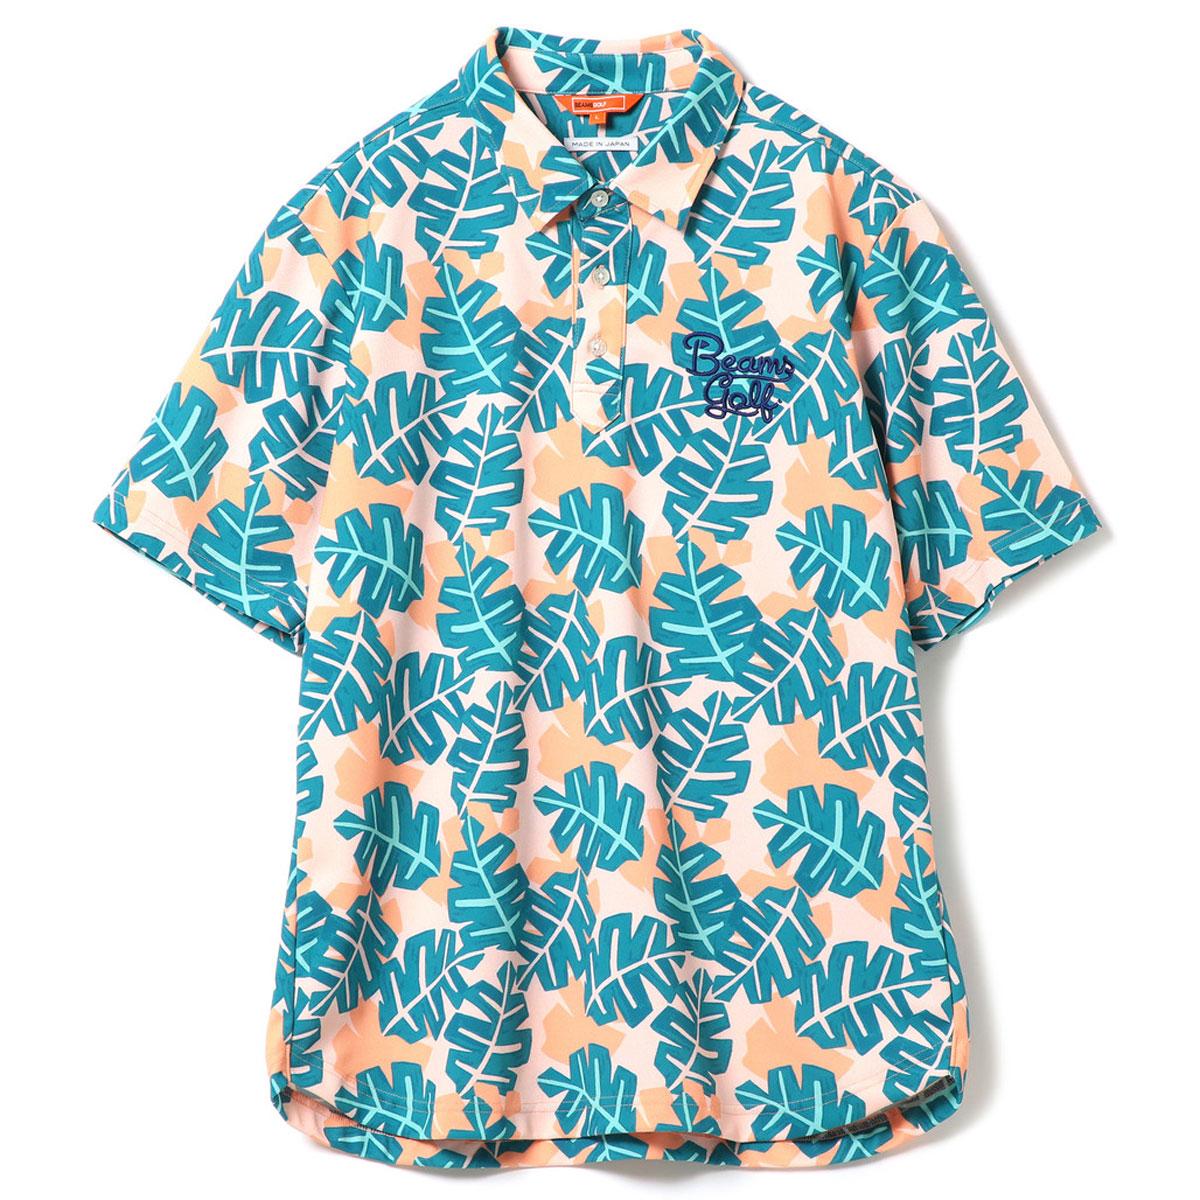 BEAMS GOLF ORANGE LABEL ハワイアン リーフ柄 ポロシャツ